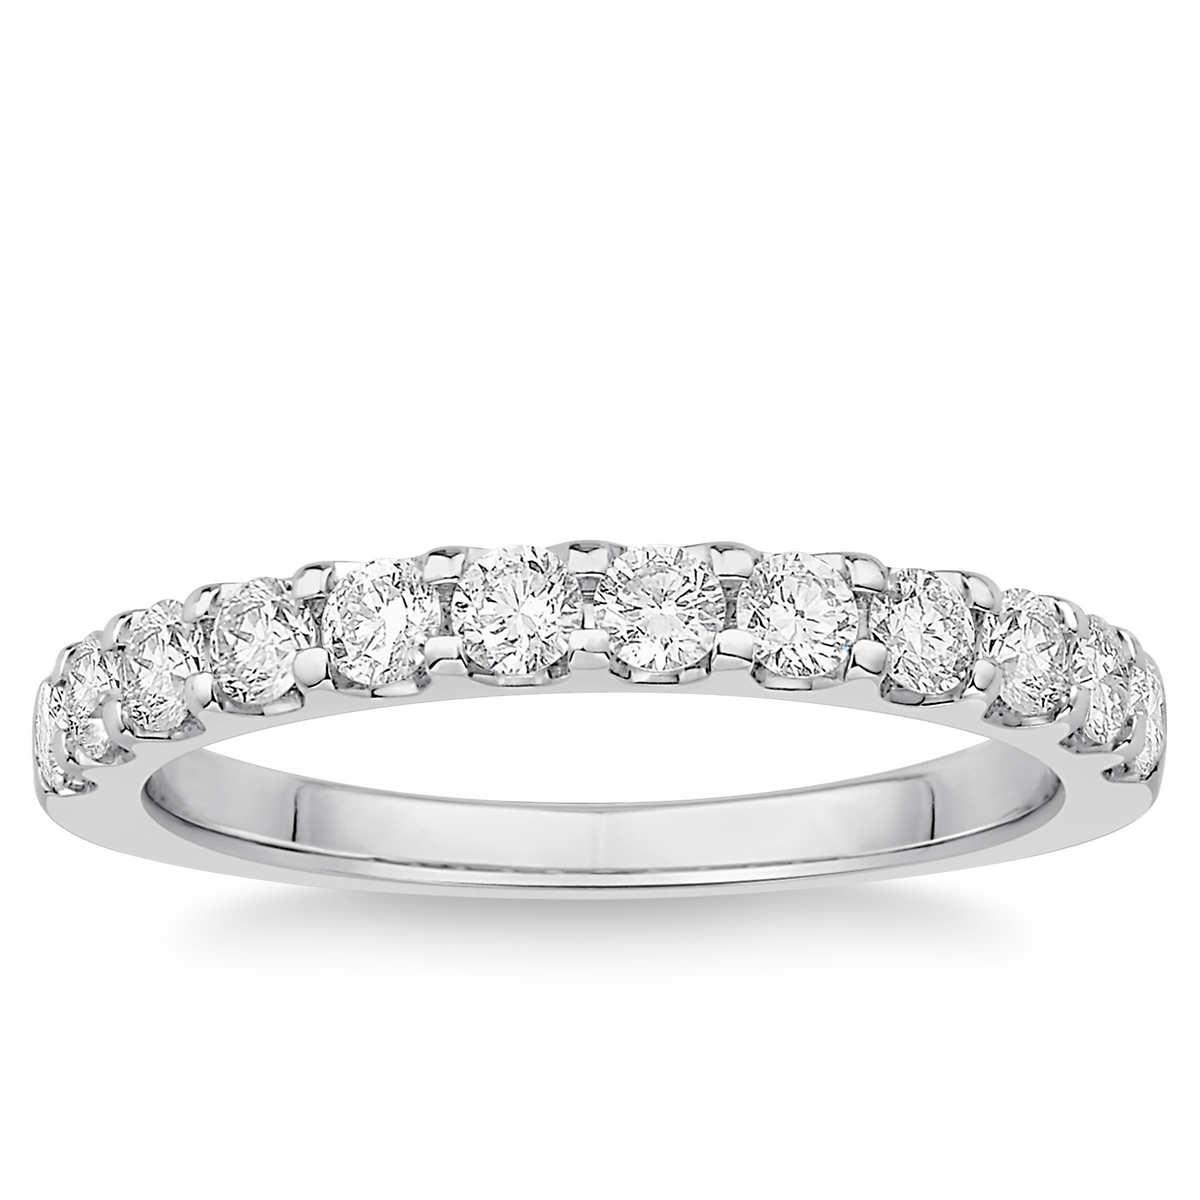 round brilliant 063 ctw vs2 clarity i color diamond platinum band - Costco Wedding Rings